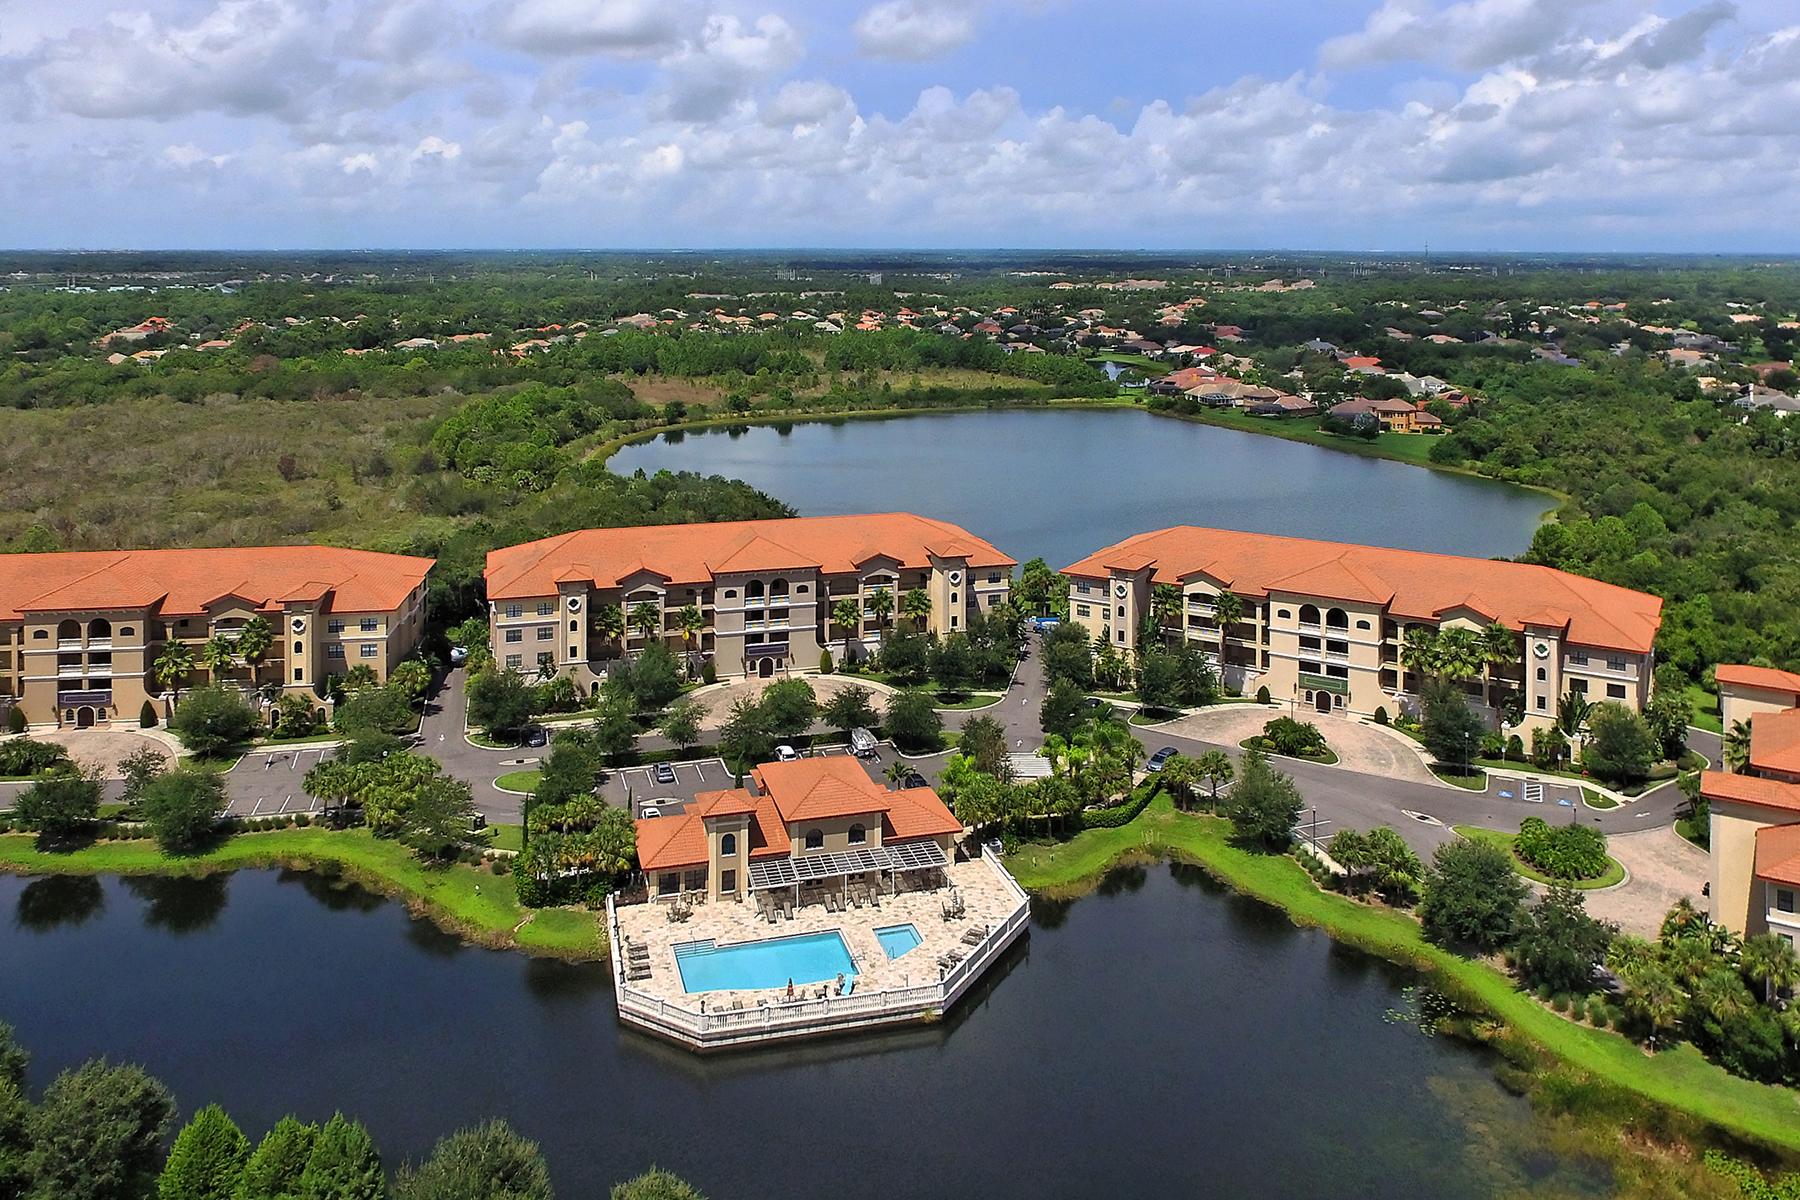 Condominium for Sale at LAKE VISTA 7702 Lake Vista Ct 203 Lakewood Ranch, Florida, 34202 United States